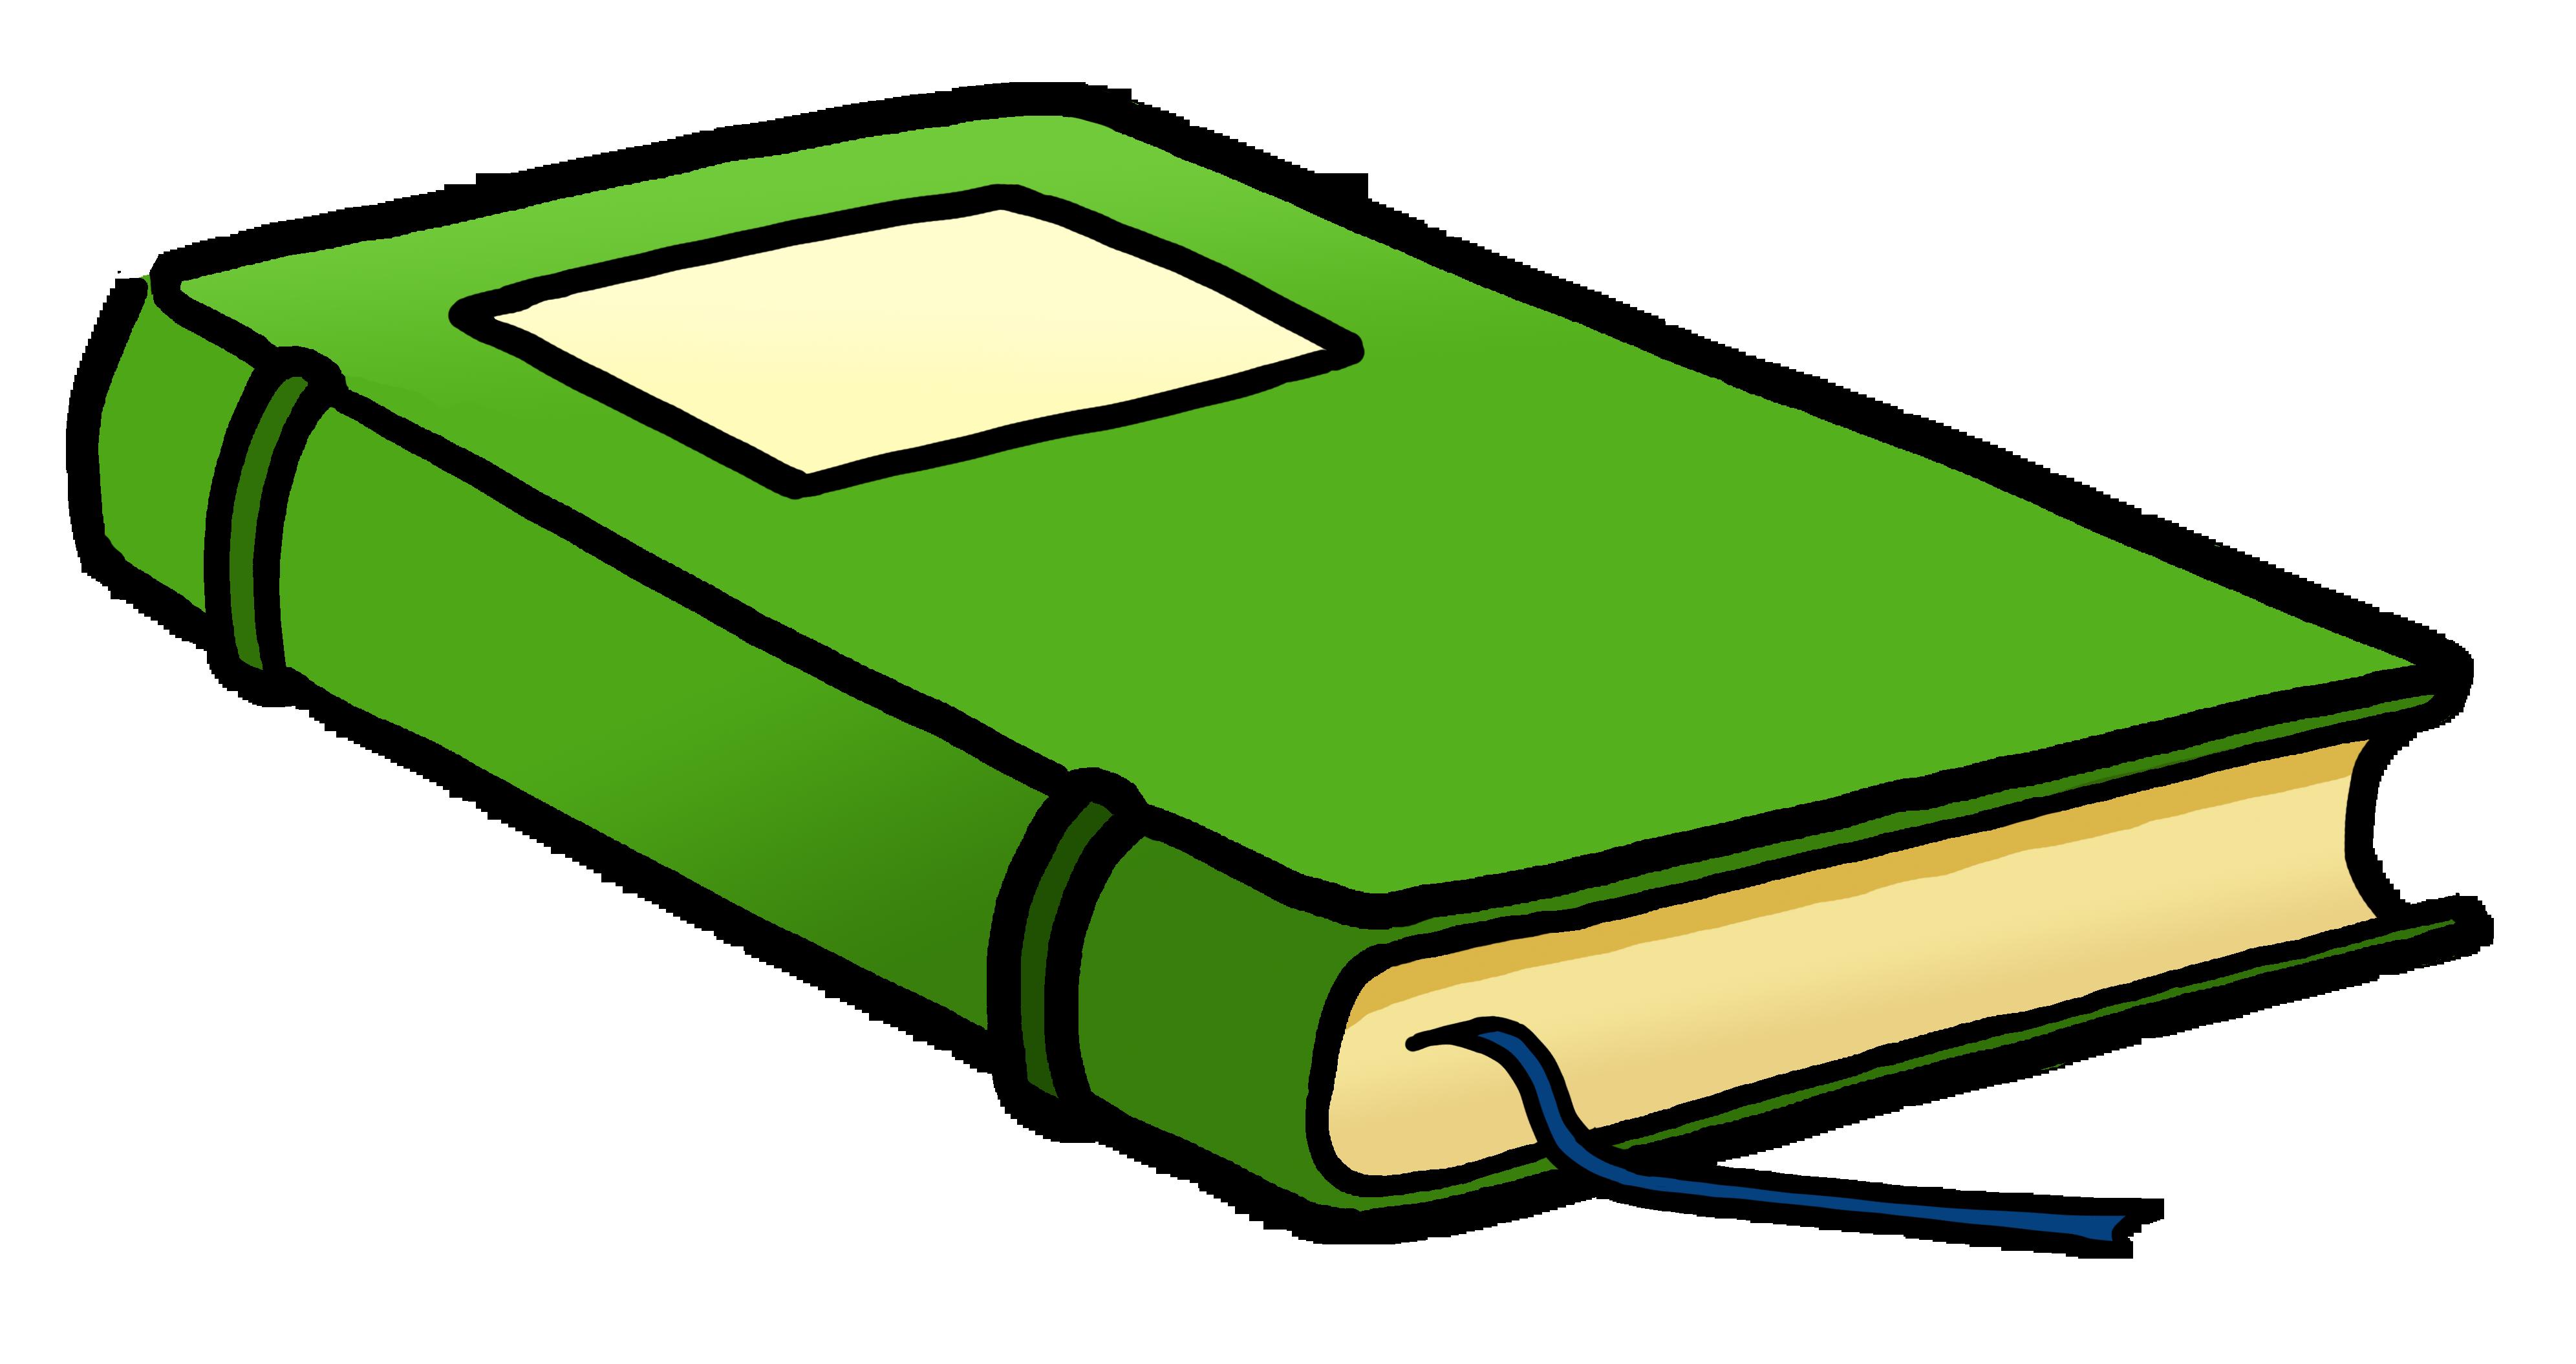 Book Clip Art-Book Clip Art-1